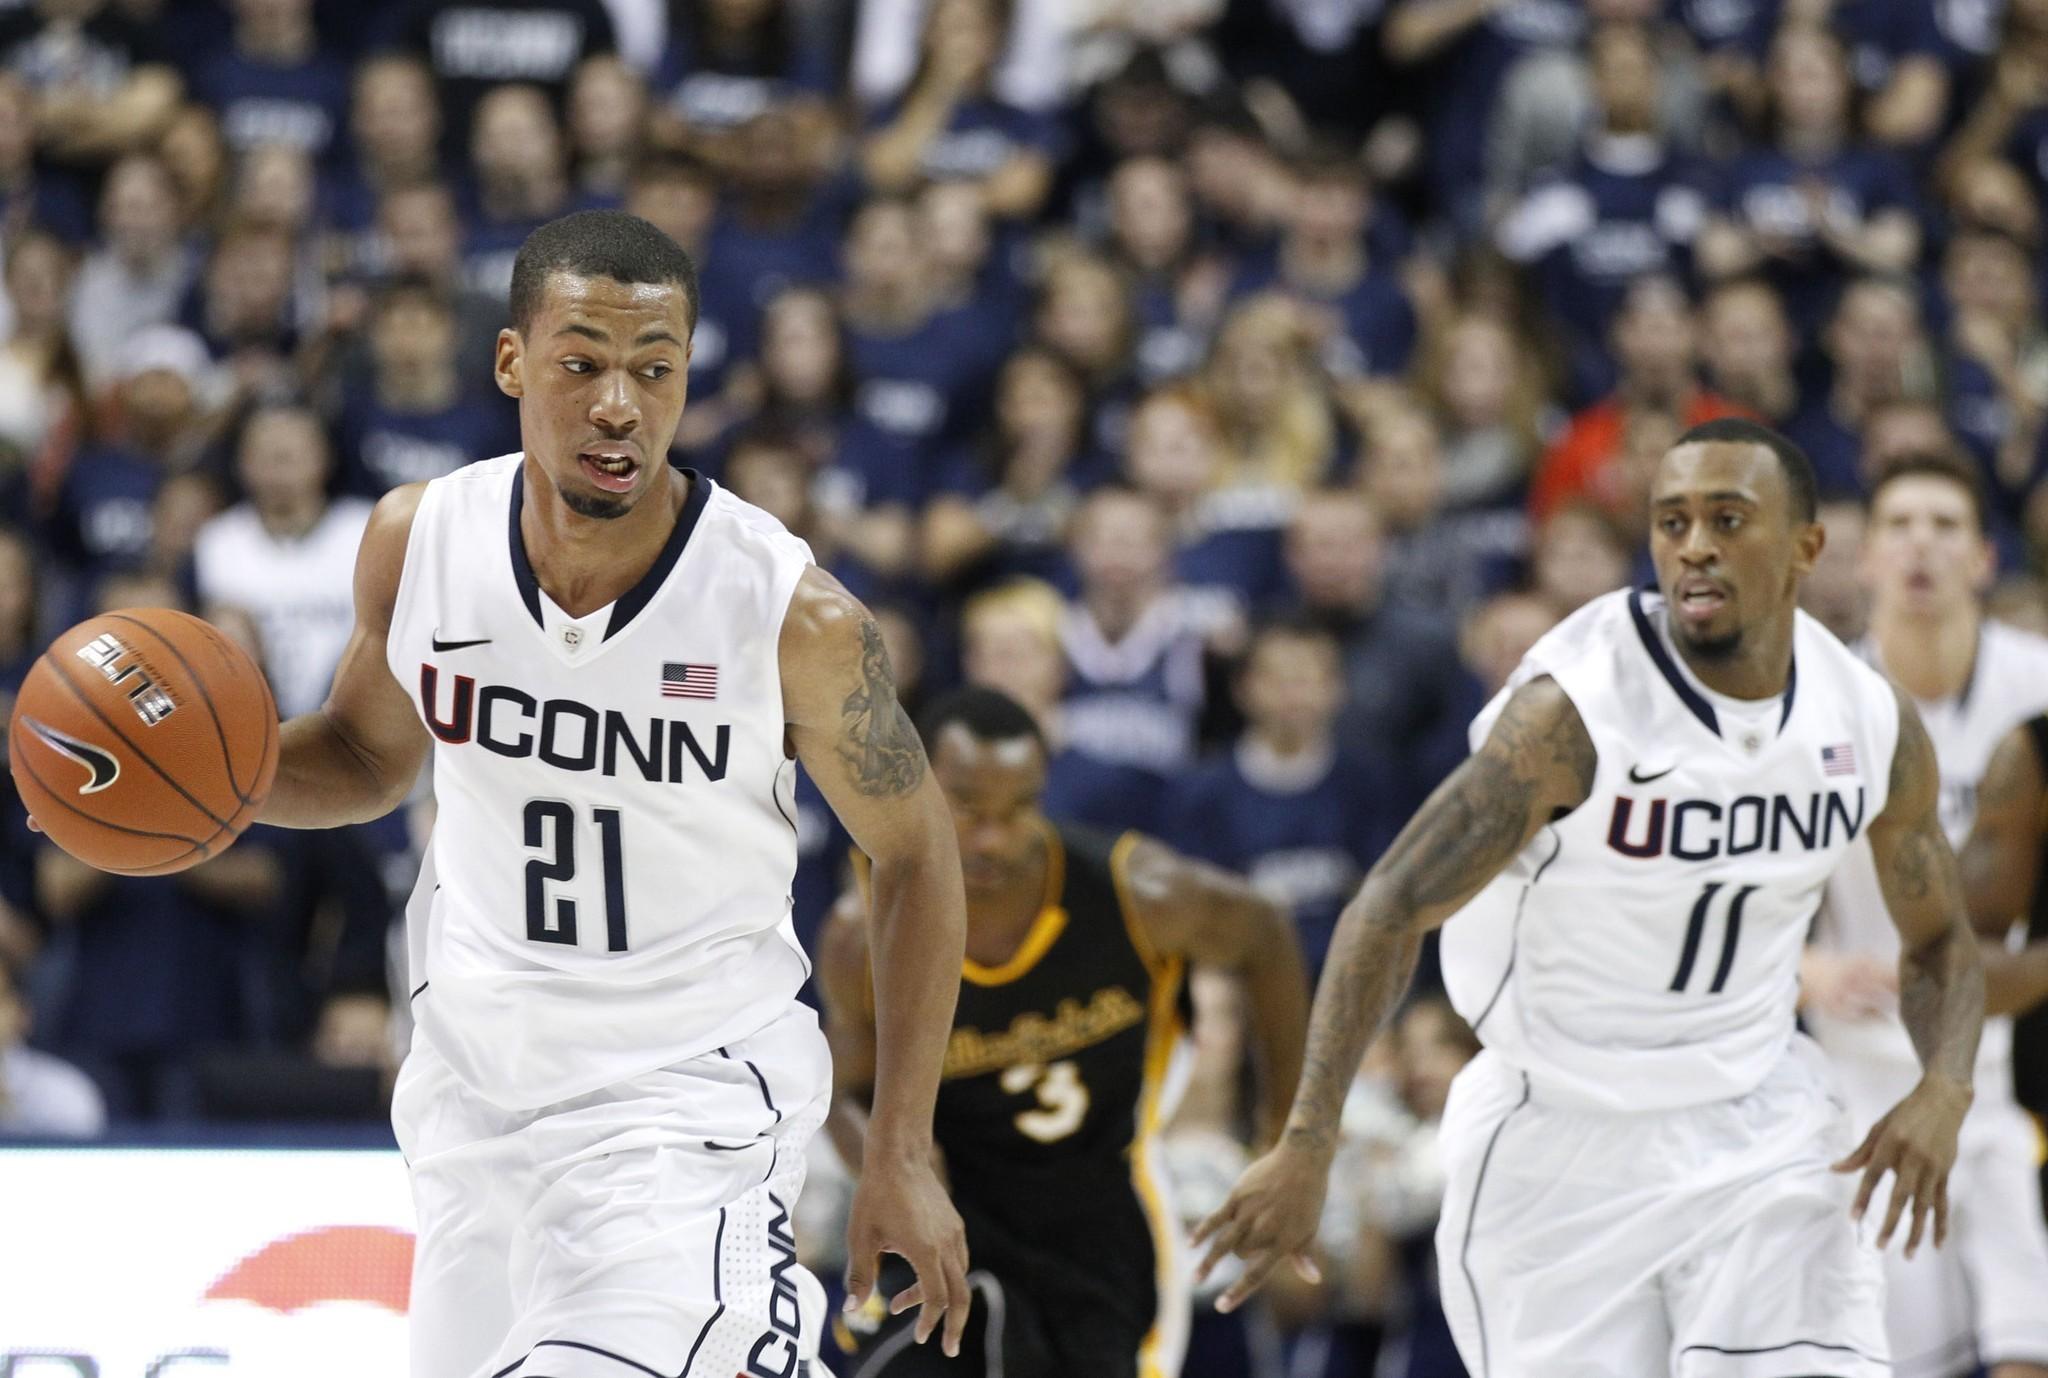 uconn men's basketball: uconn men's basketball team bulks up, adds